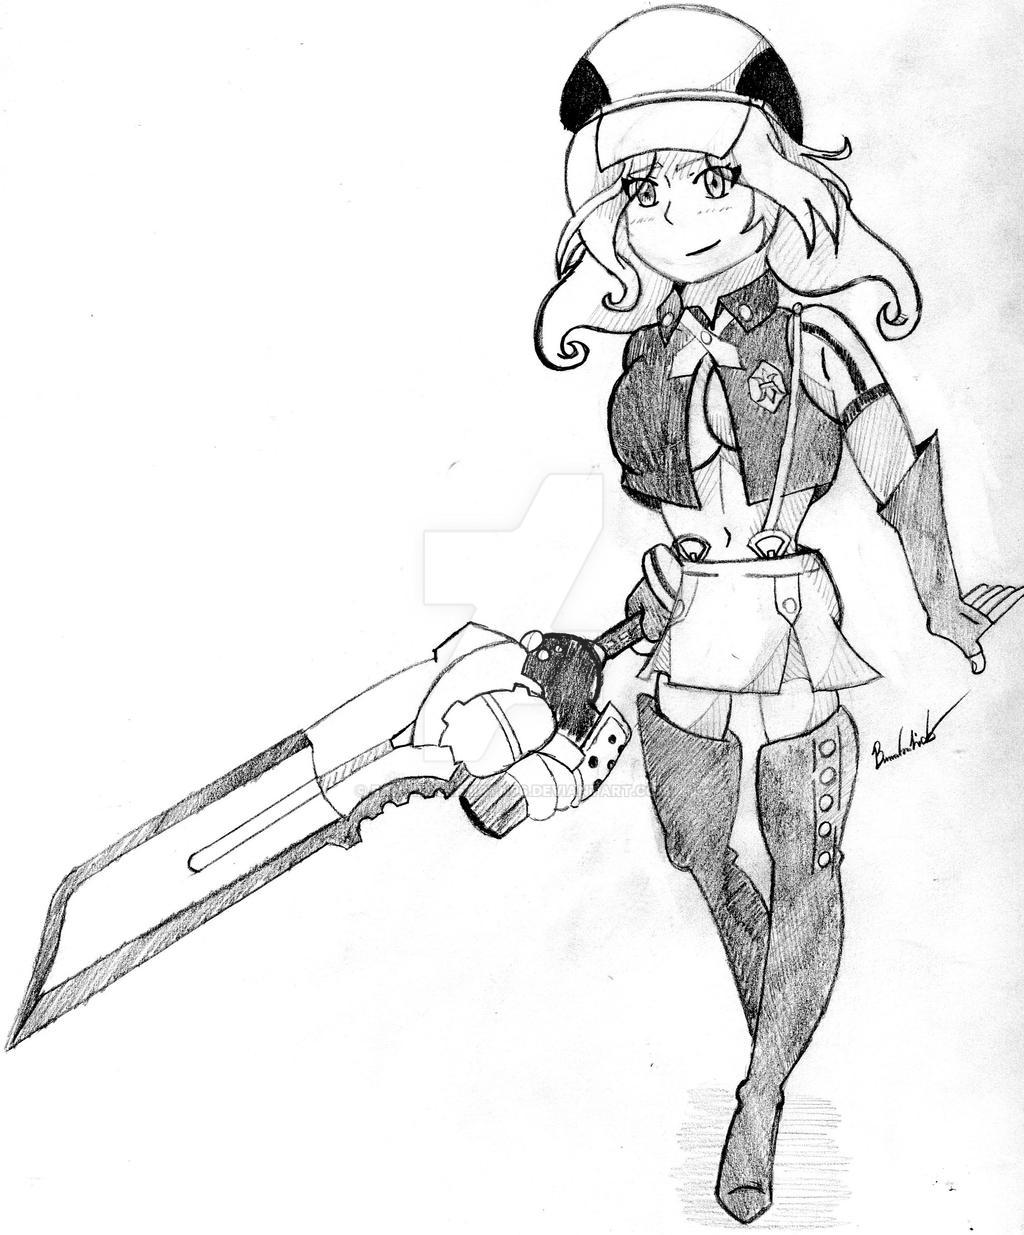 Alisa Sketch by FantasyRebirth96